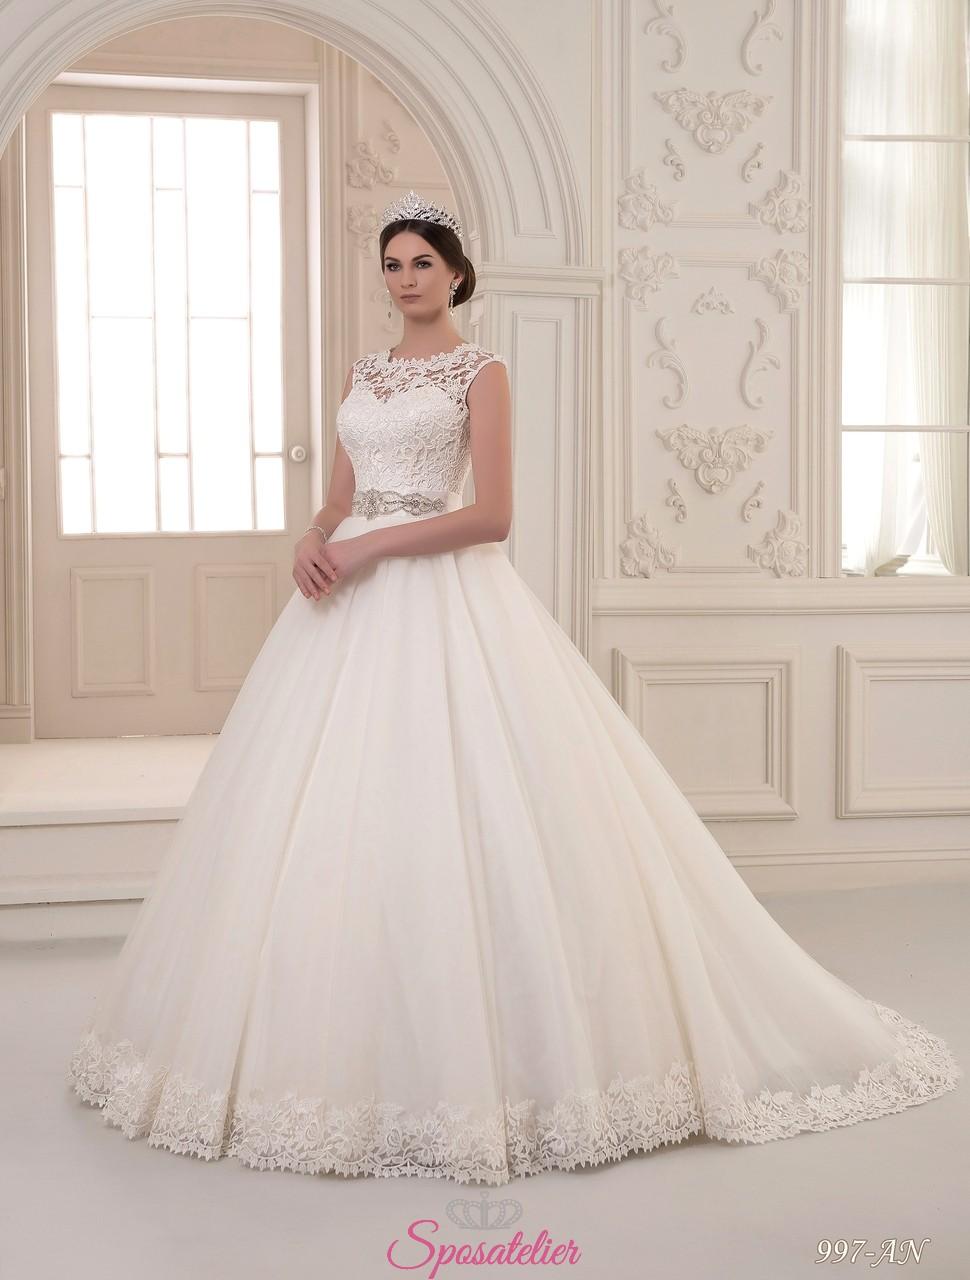 50602a7d48d5 Felicia- vendita abiti da sposa economici online ItaliaSposatelier